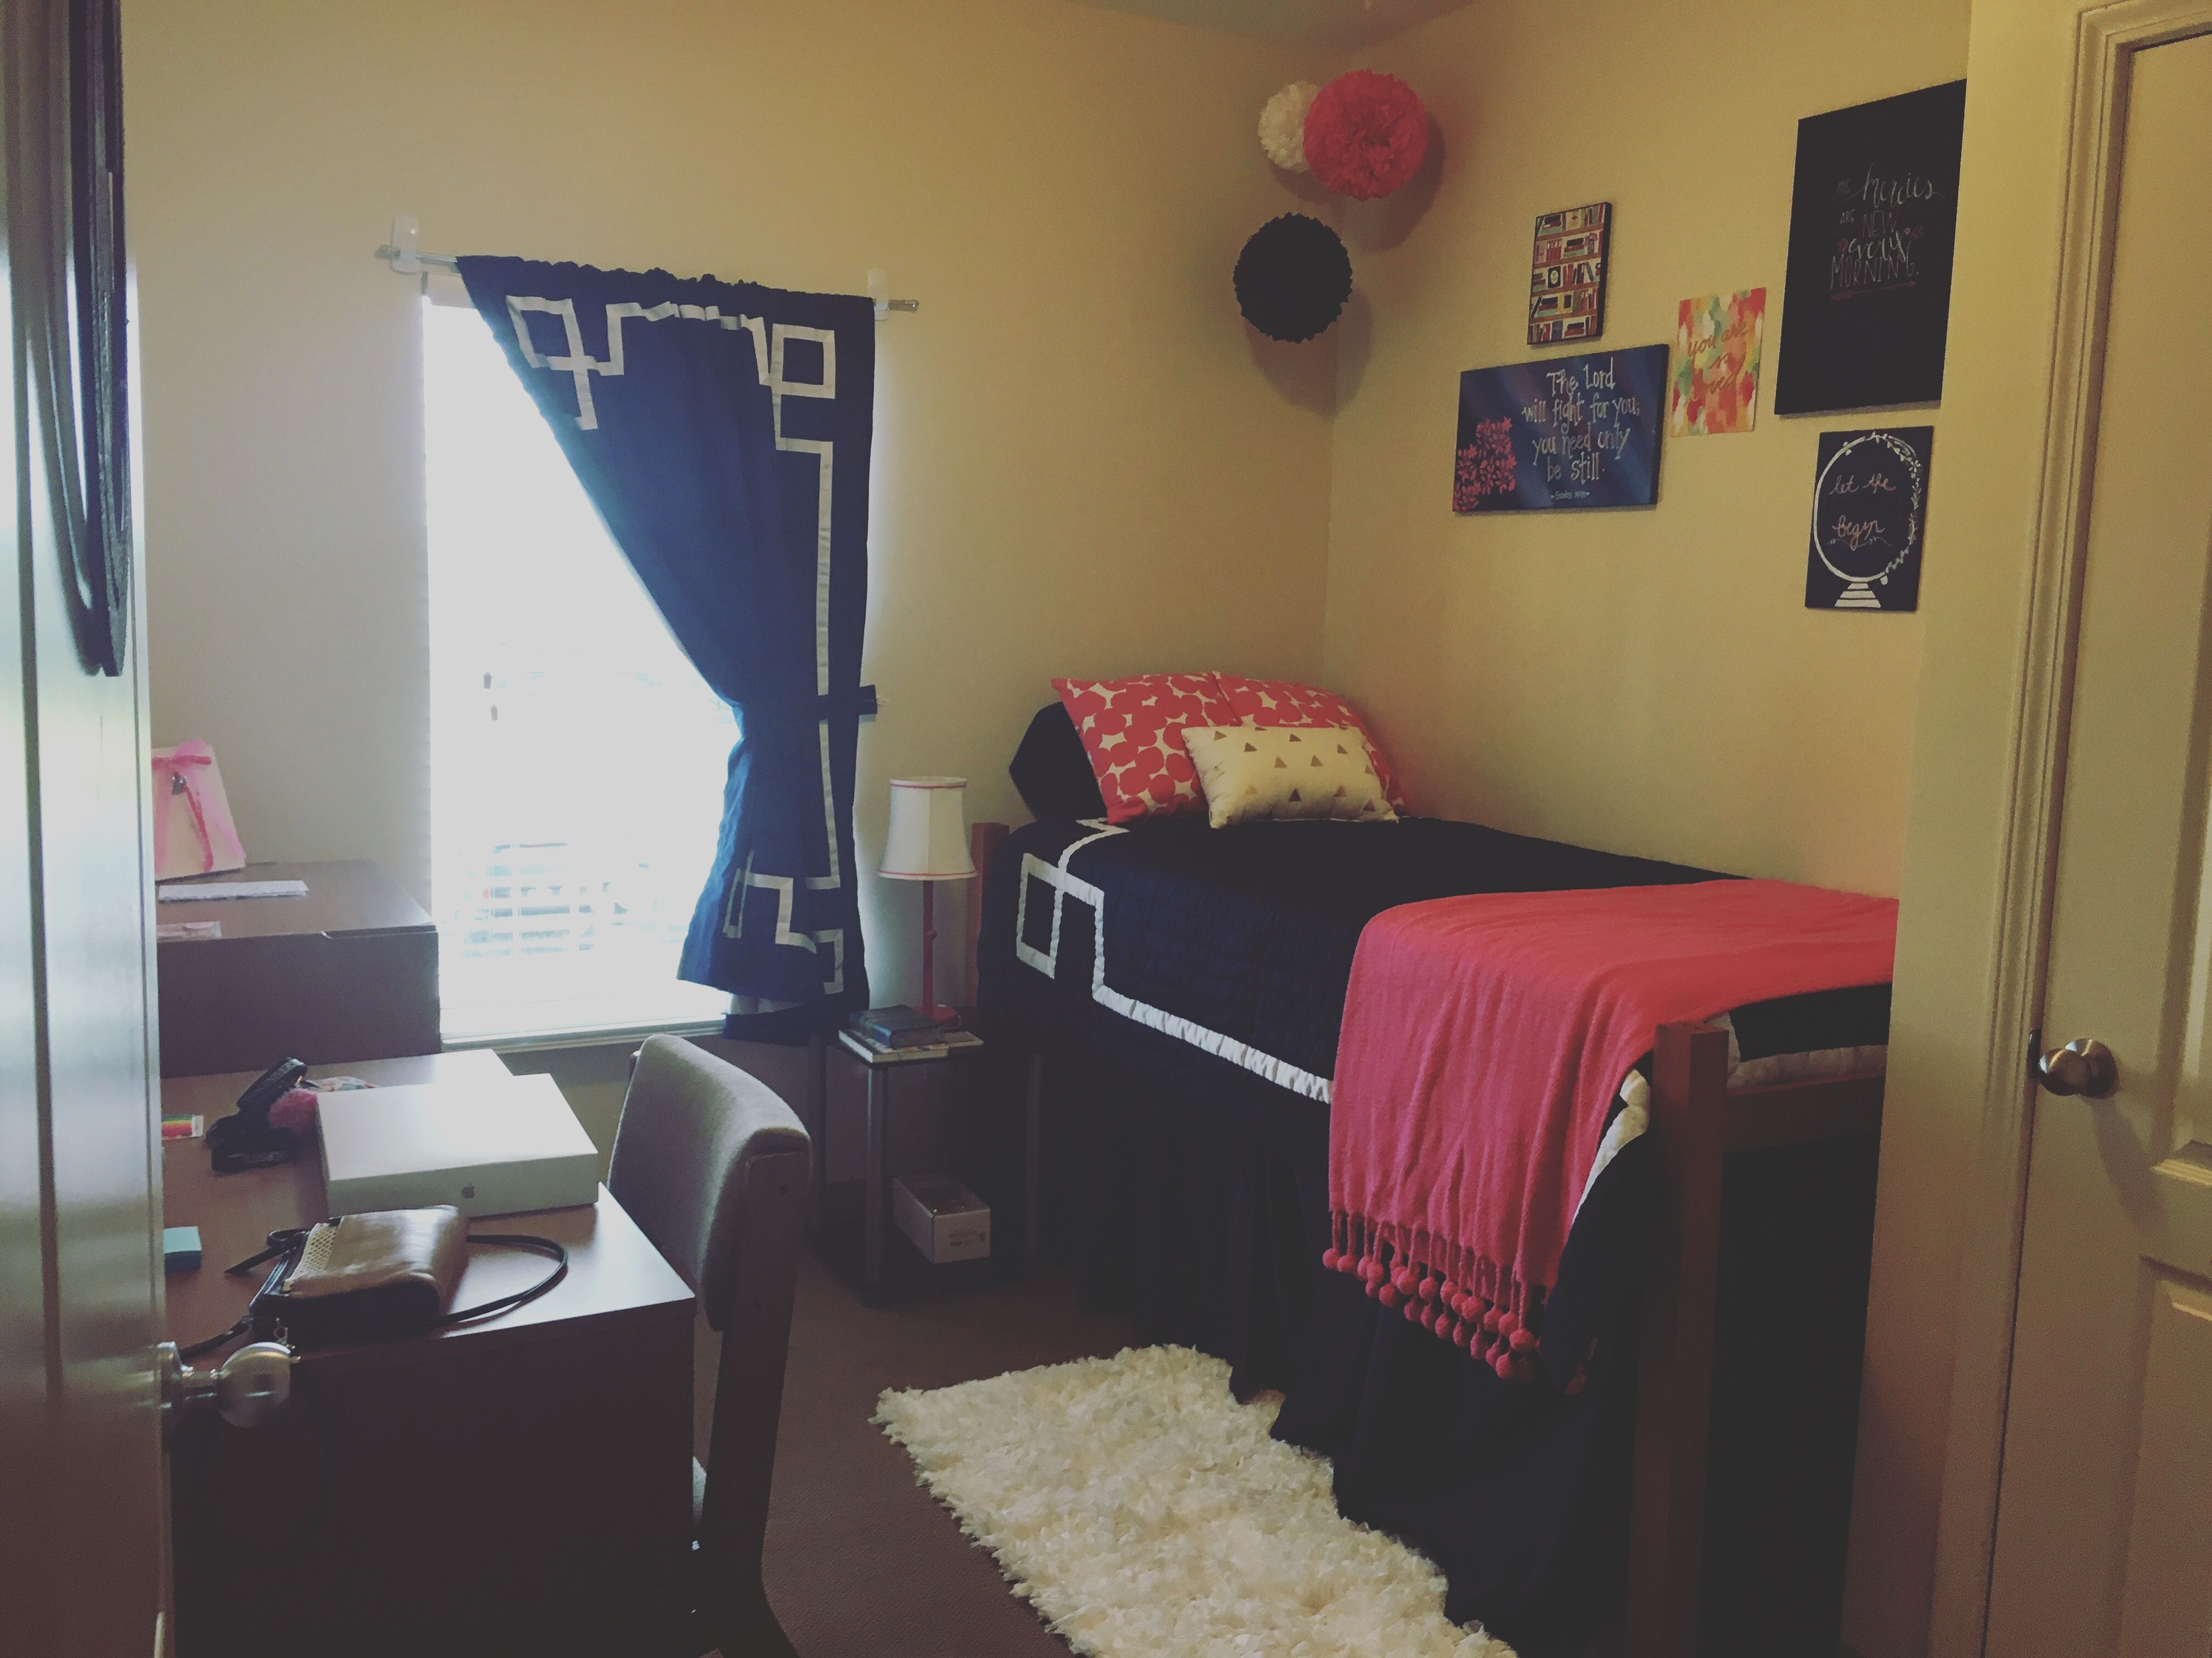 Troy University Trojan Village Dorm Room